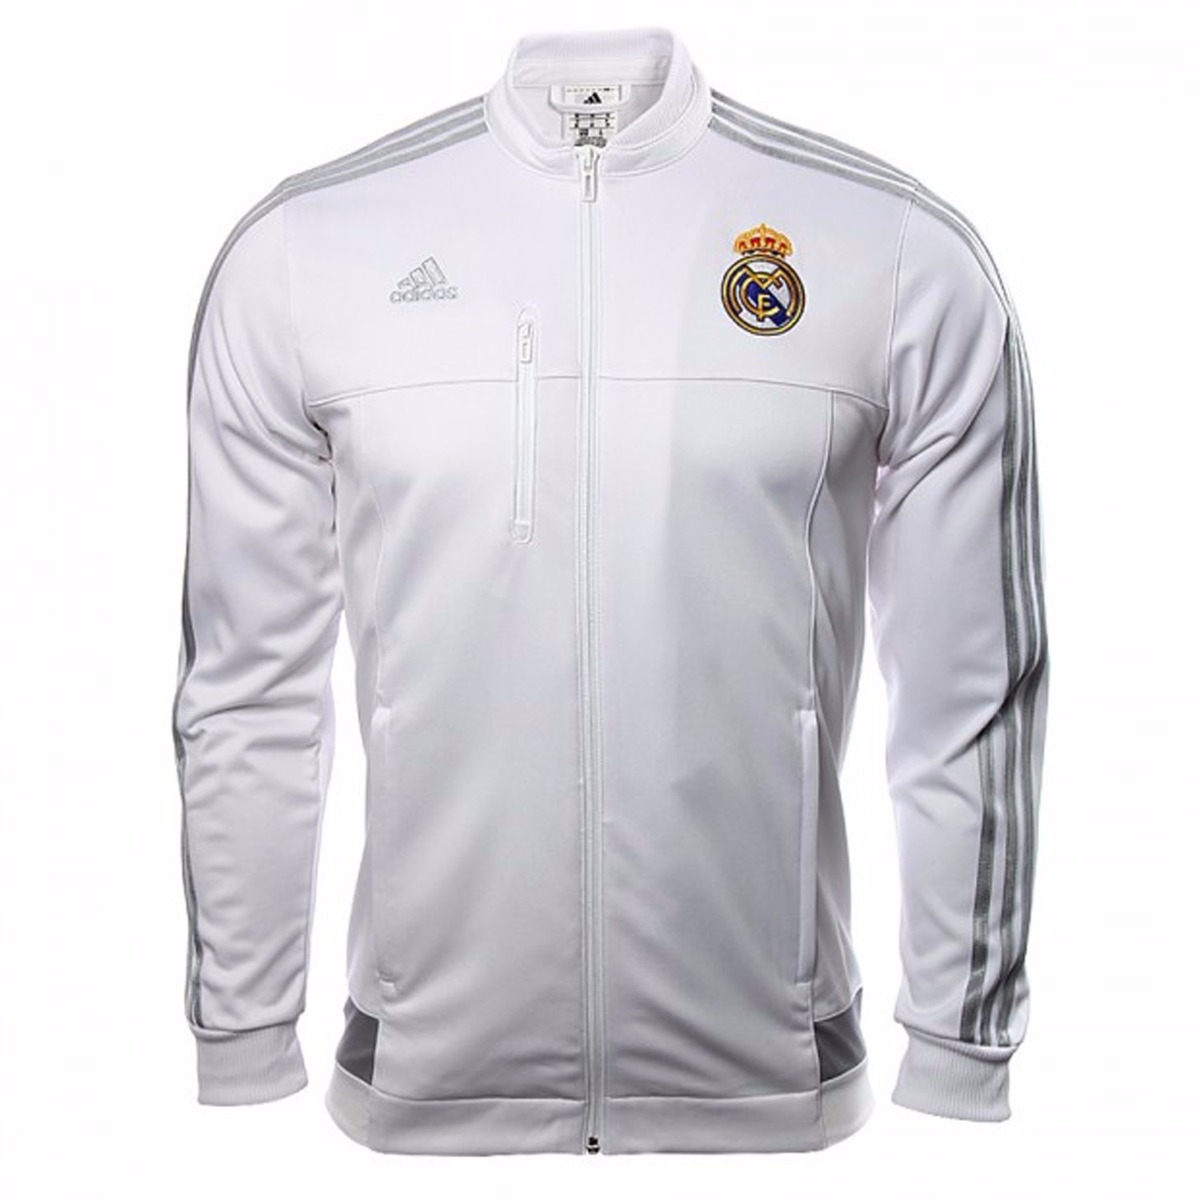 91ce221f00c4e Sudadera Chamarra Anthem Real Madrid adidas Aa1660 -   749.00 en ...